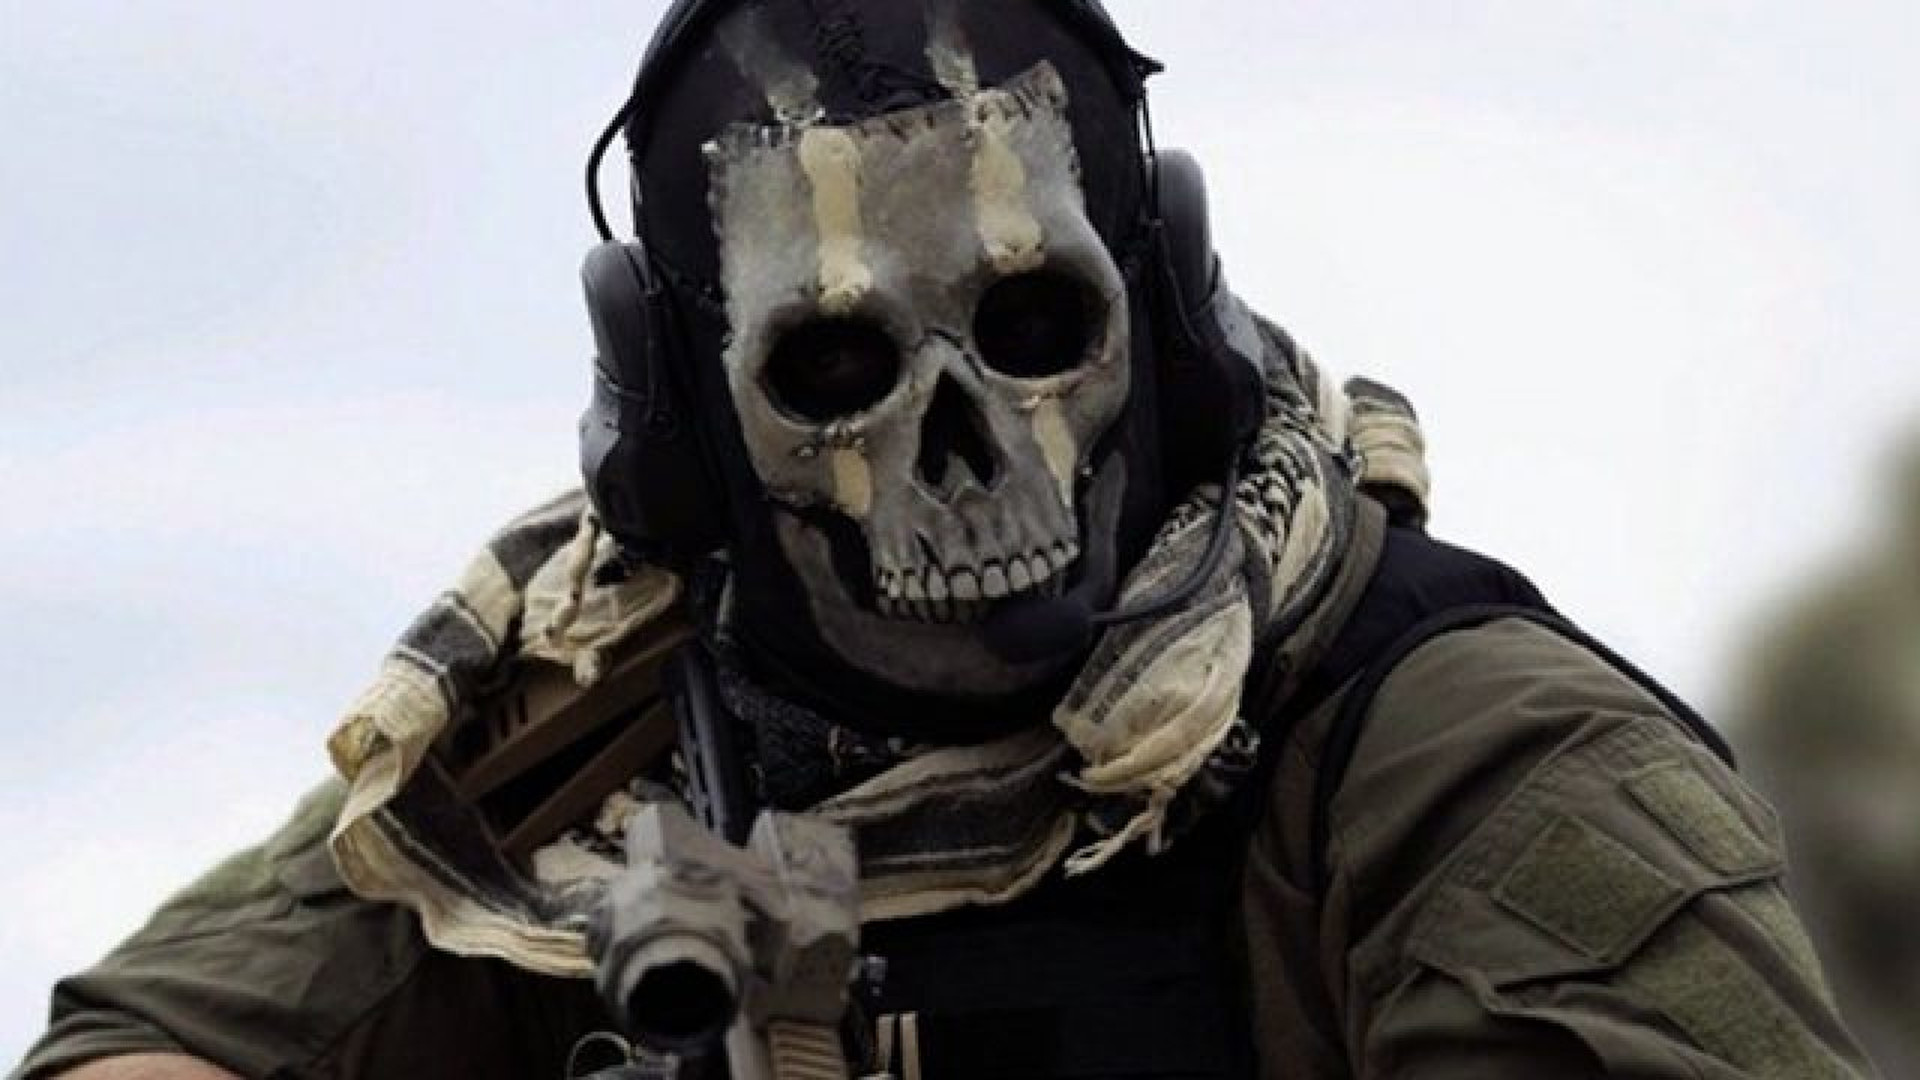 Ghost Returns To Call Of Duty Modern Warfare Next Week The Loadout